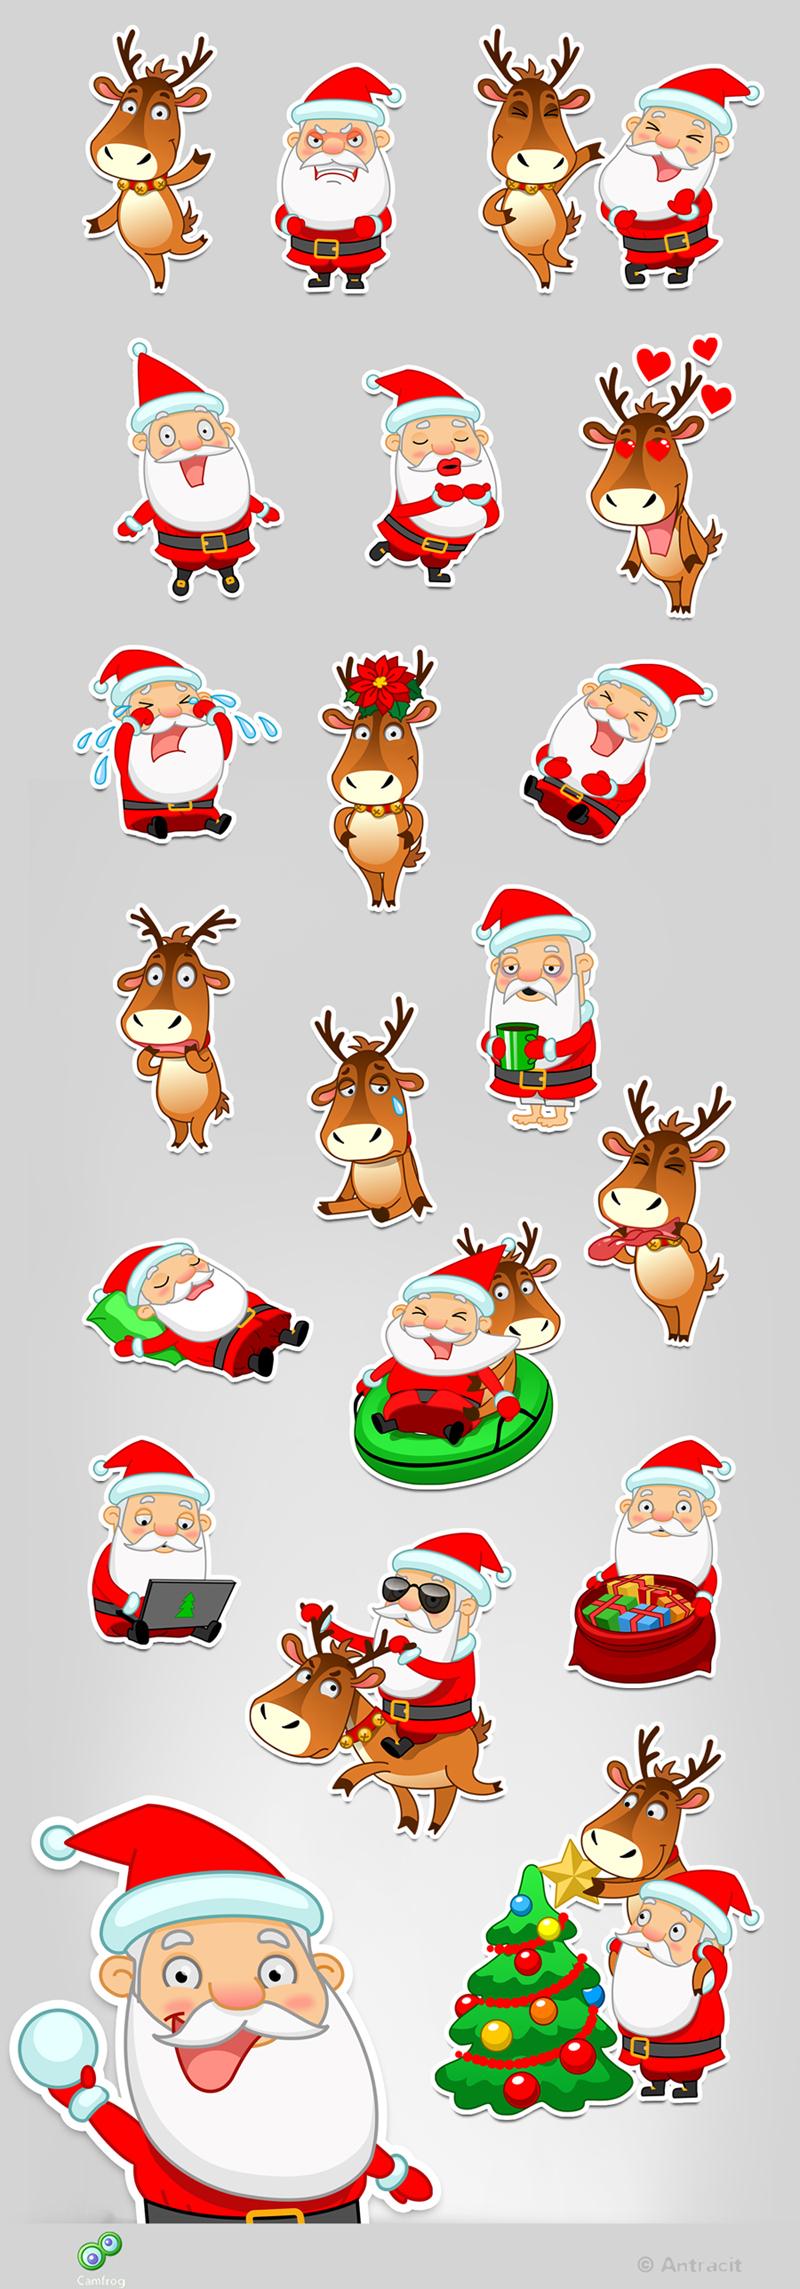 snowman reindeer santa claus penguin new year Christmas Coffee Sadness emotions joy fear christmas Tree sleigh